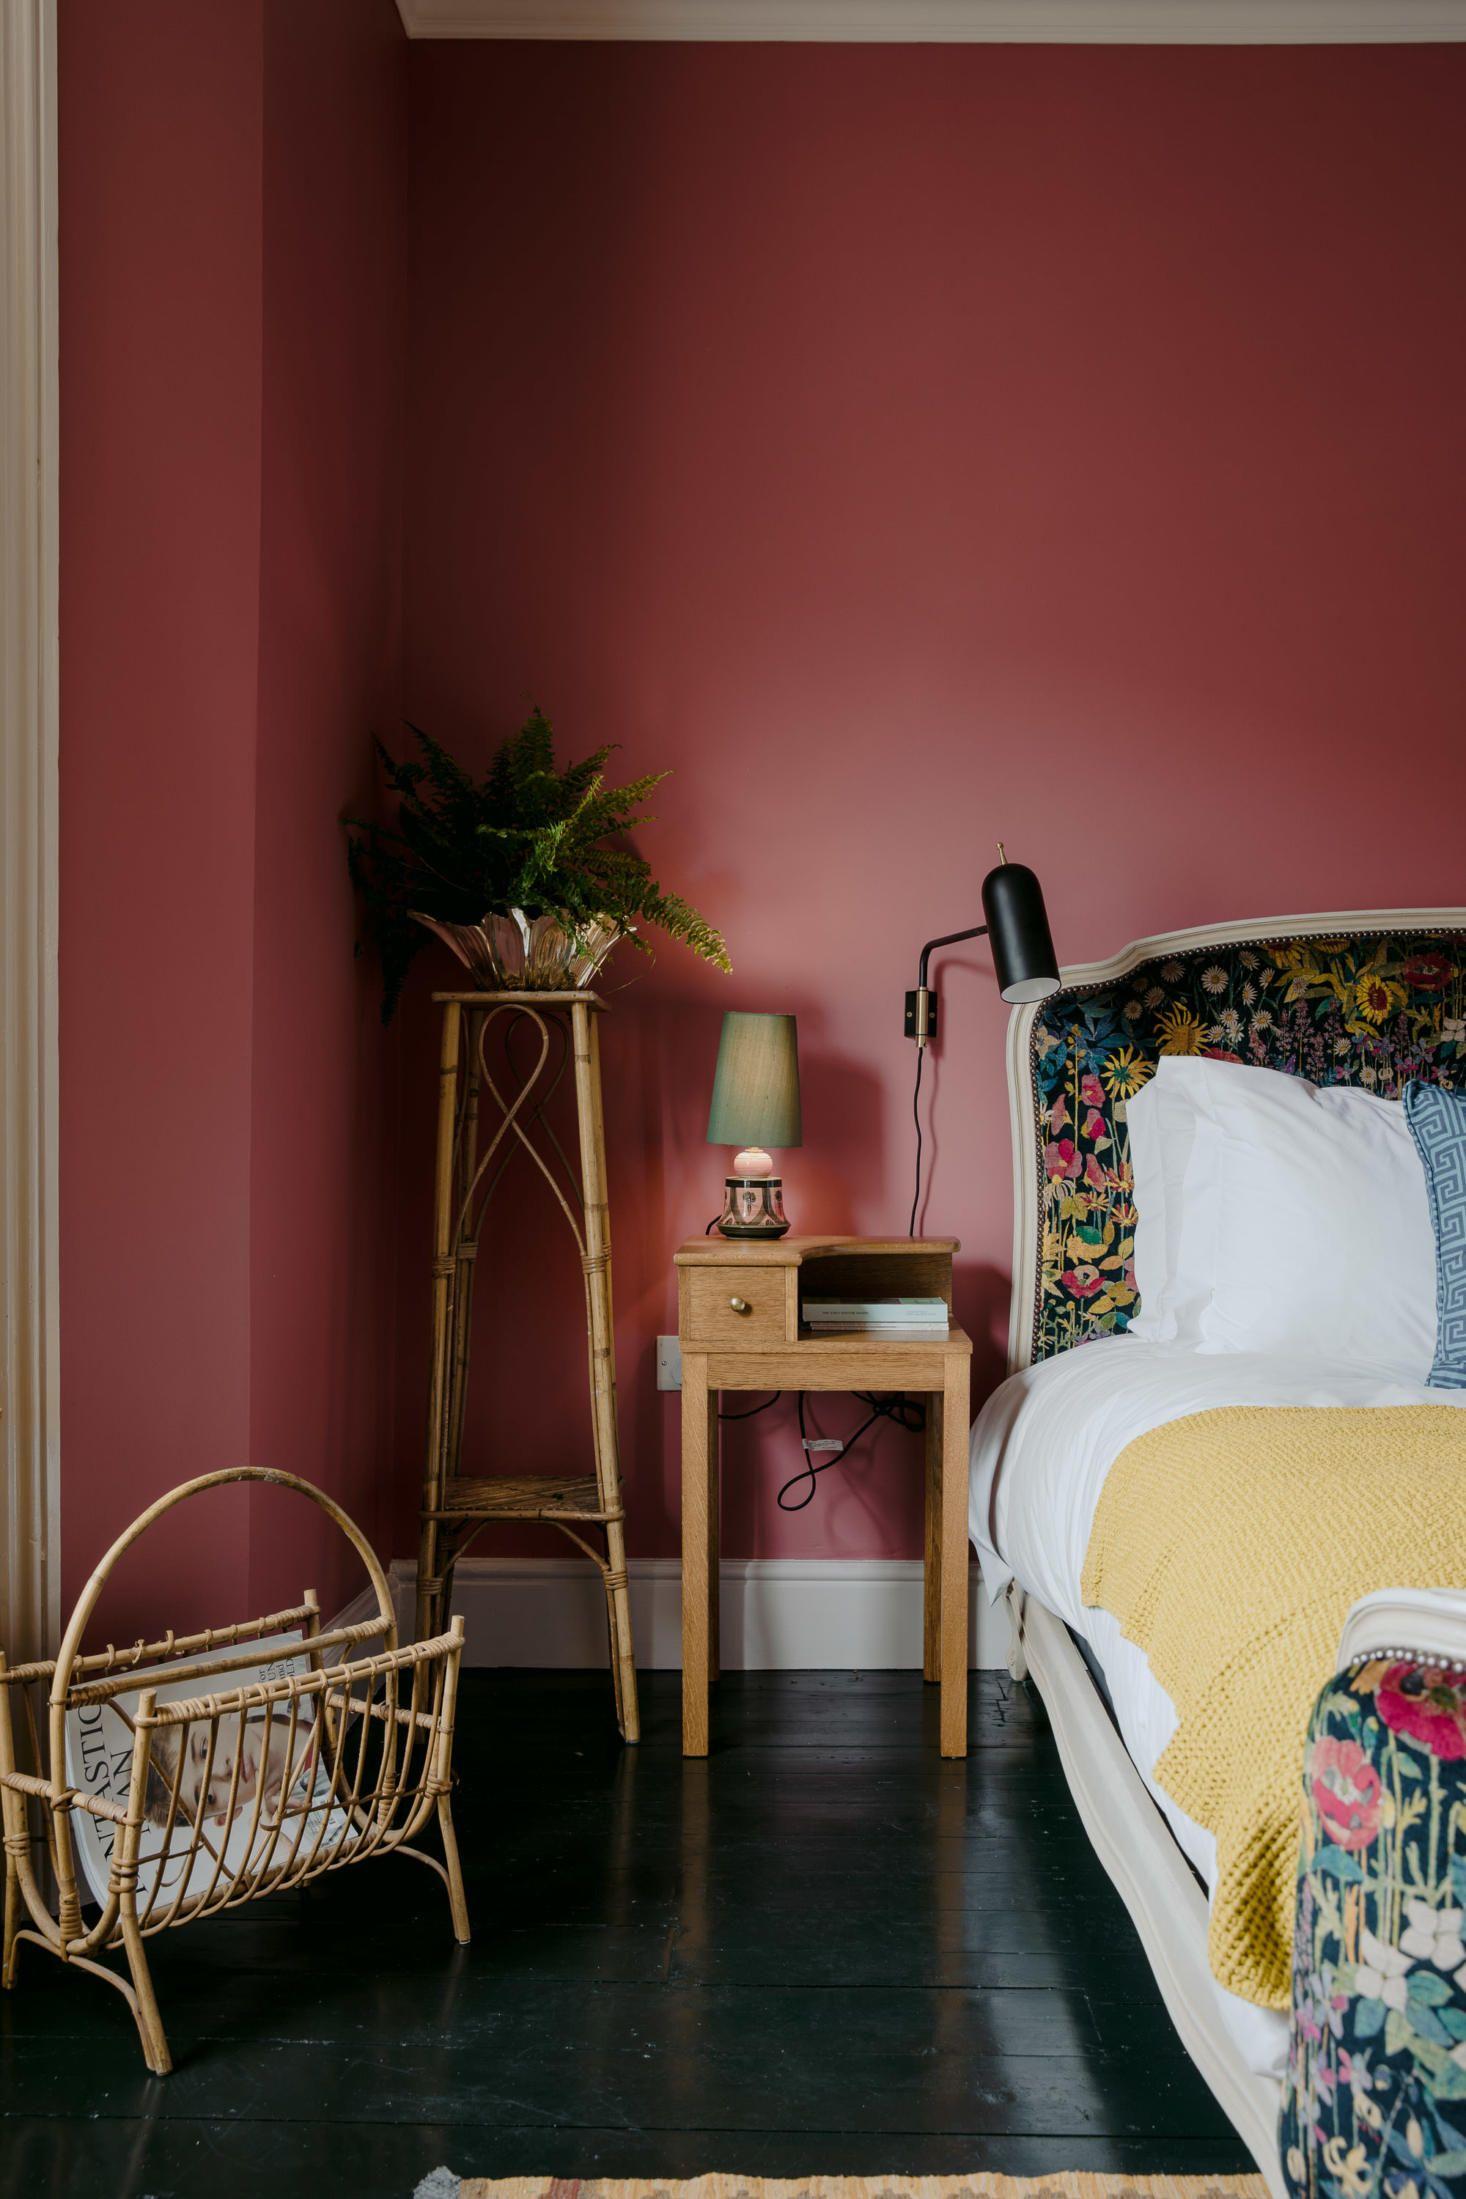 The Rose A Singular Seaside Inn On The English Coast Color